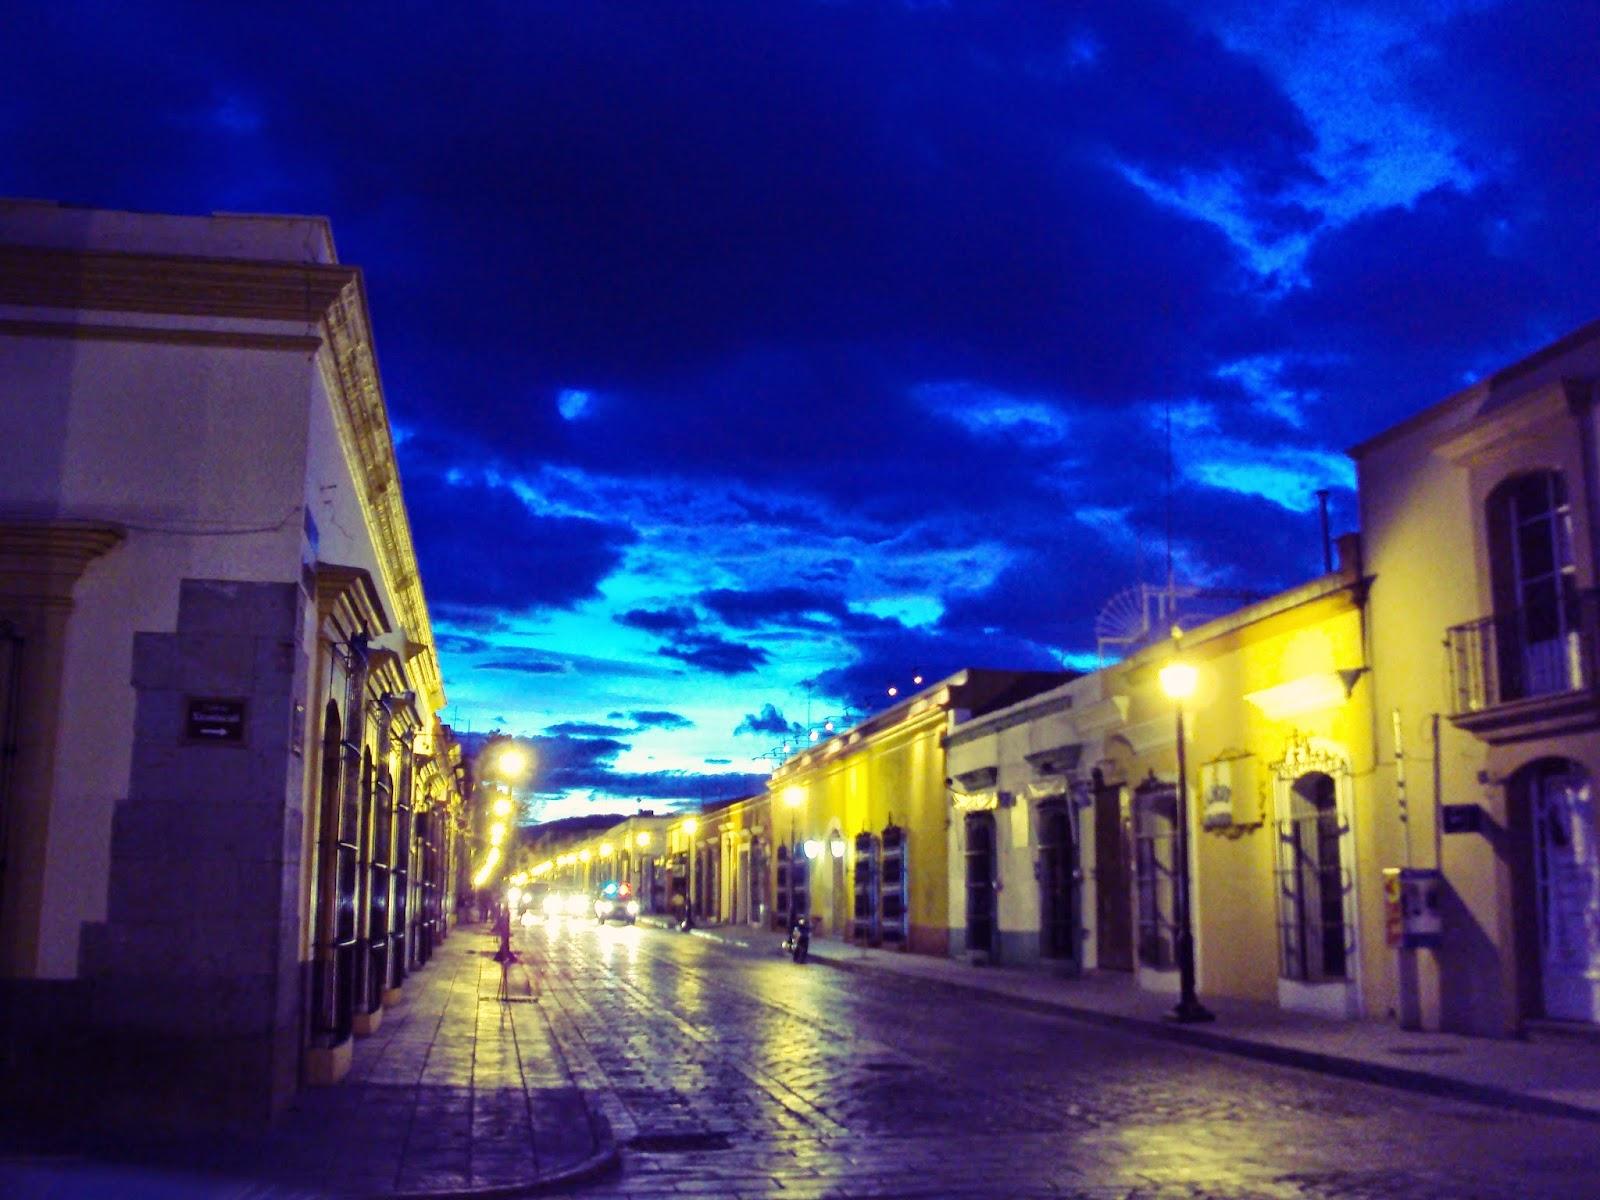 Fotograf as y paisajes oaxaca de juarez for Viveros en oaxaca